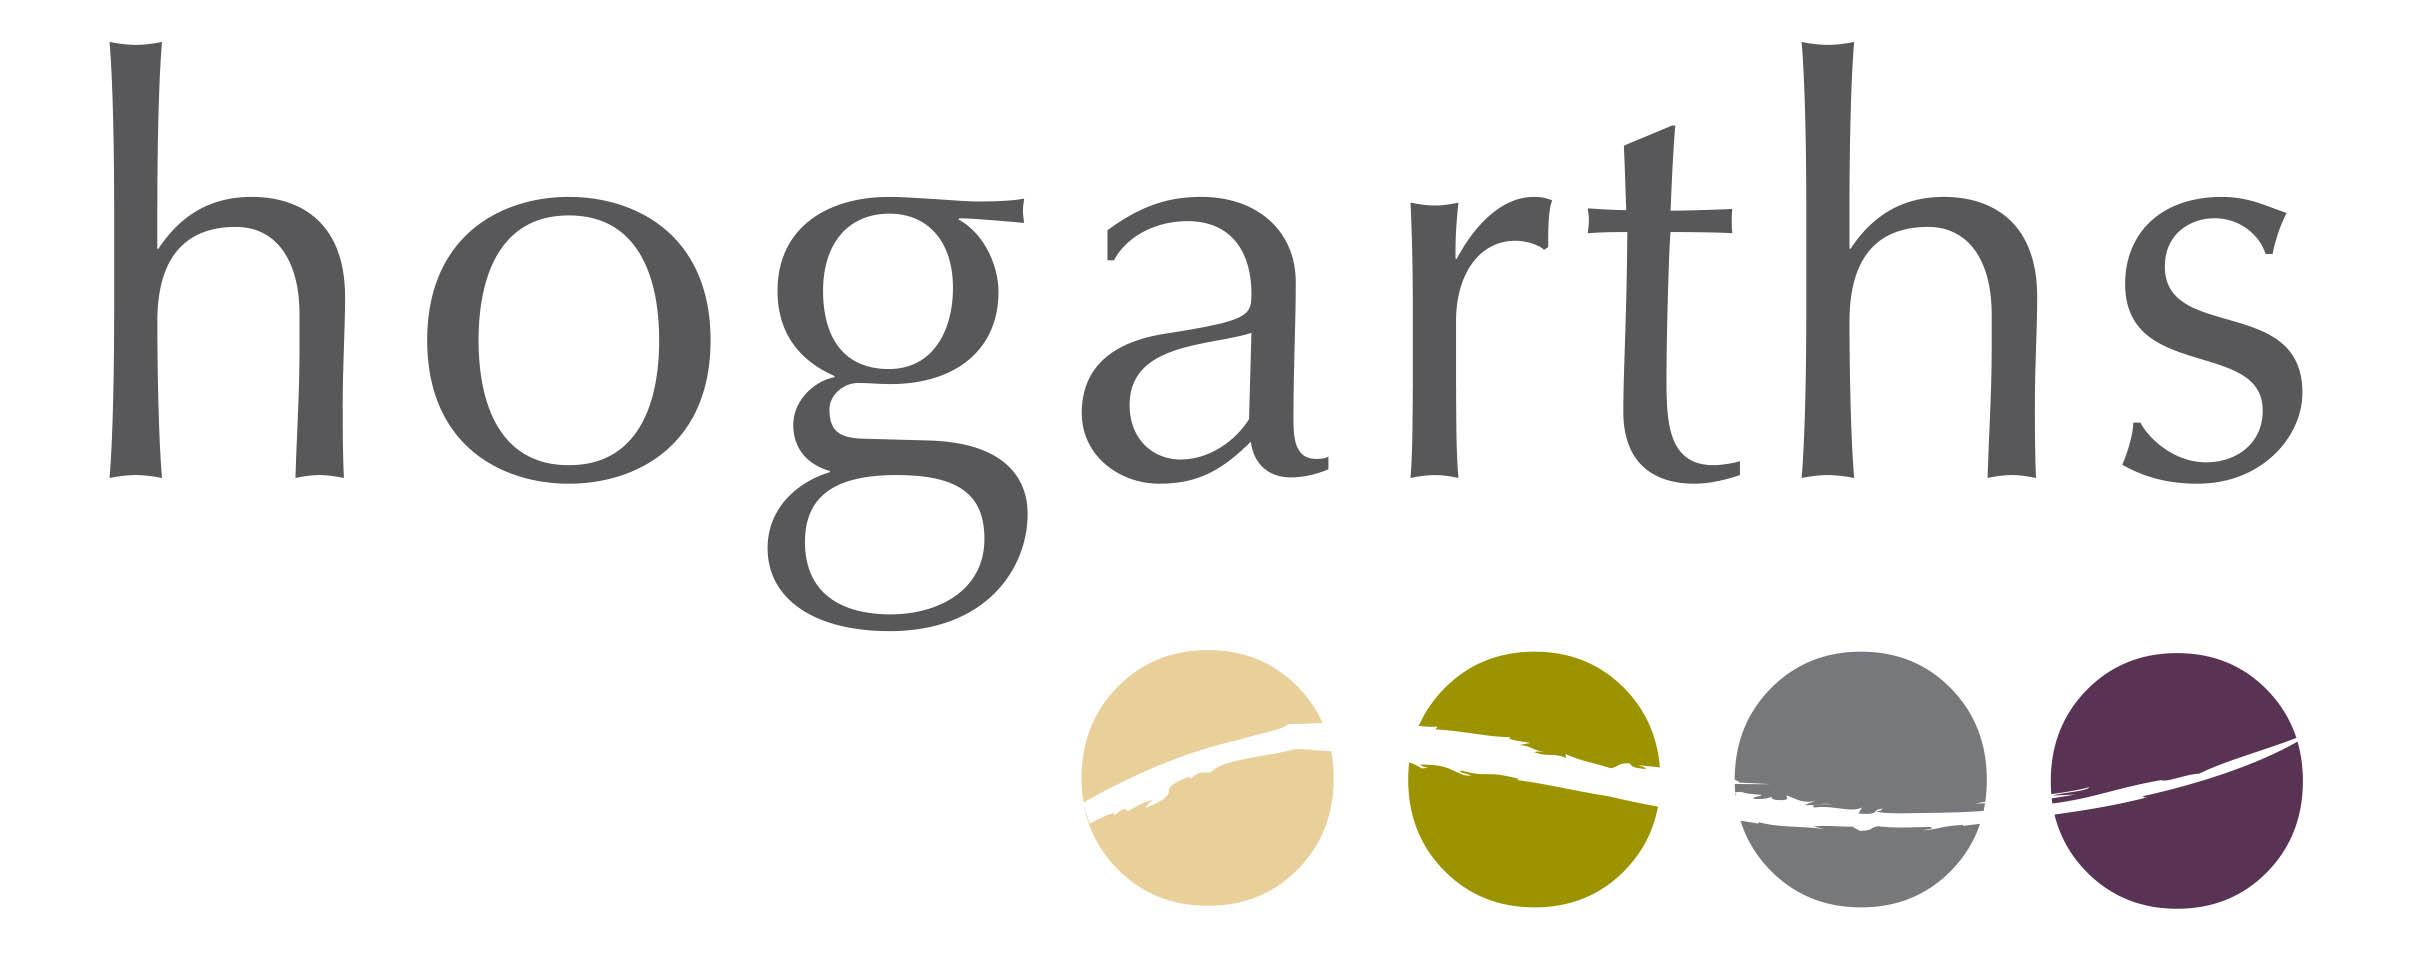 Hogarths-logo-no-restaurant-2